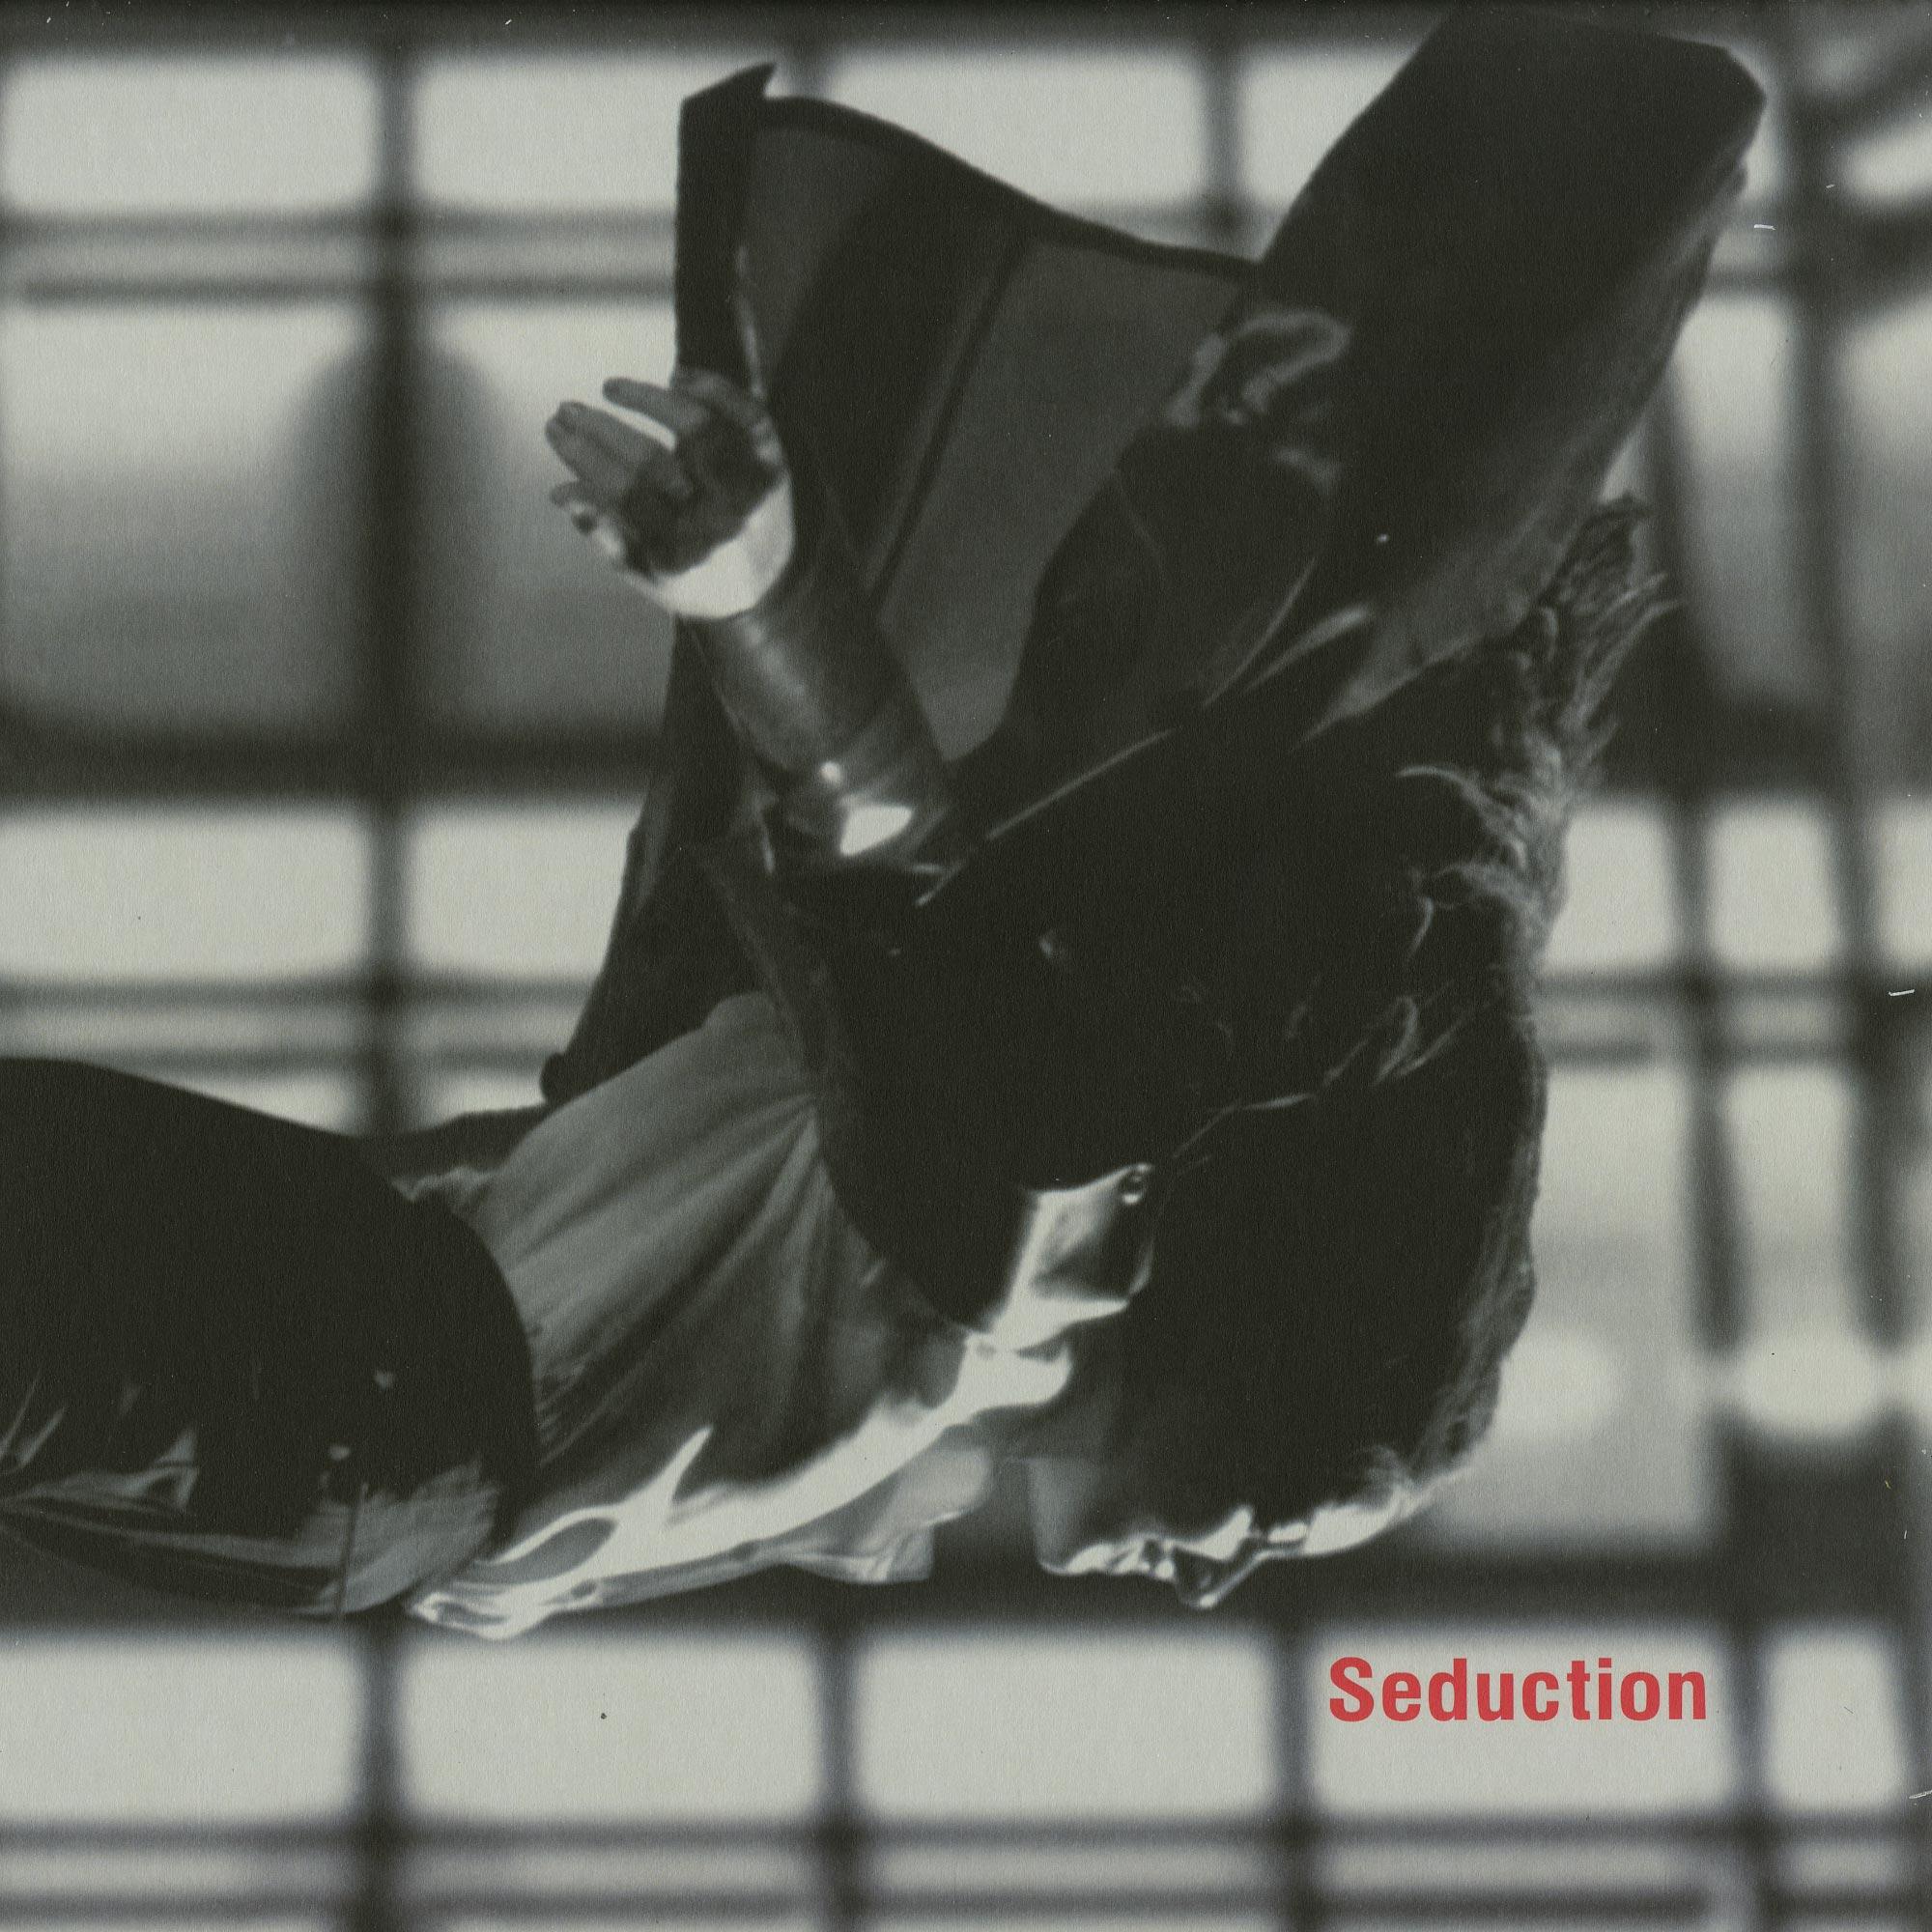 Marcel Dettmann - SEDUCTION